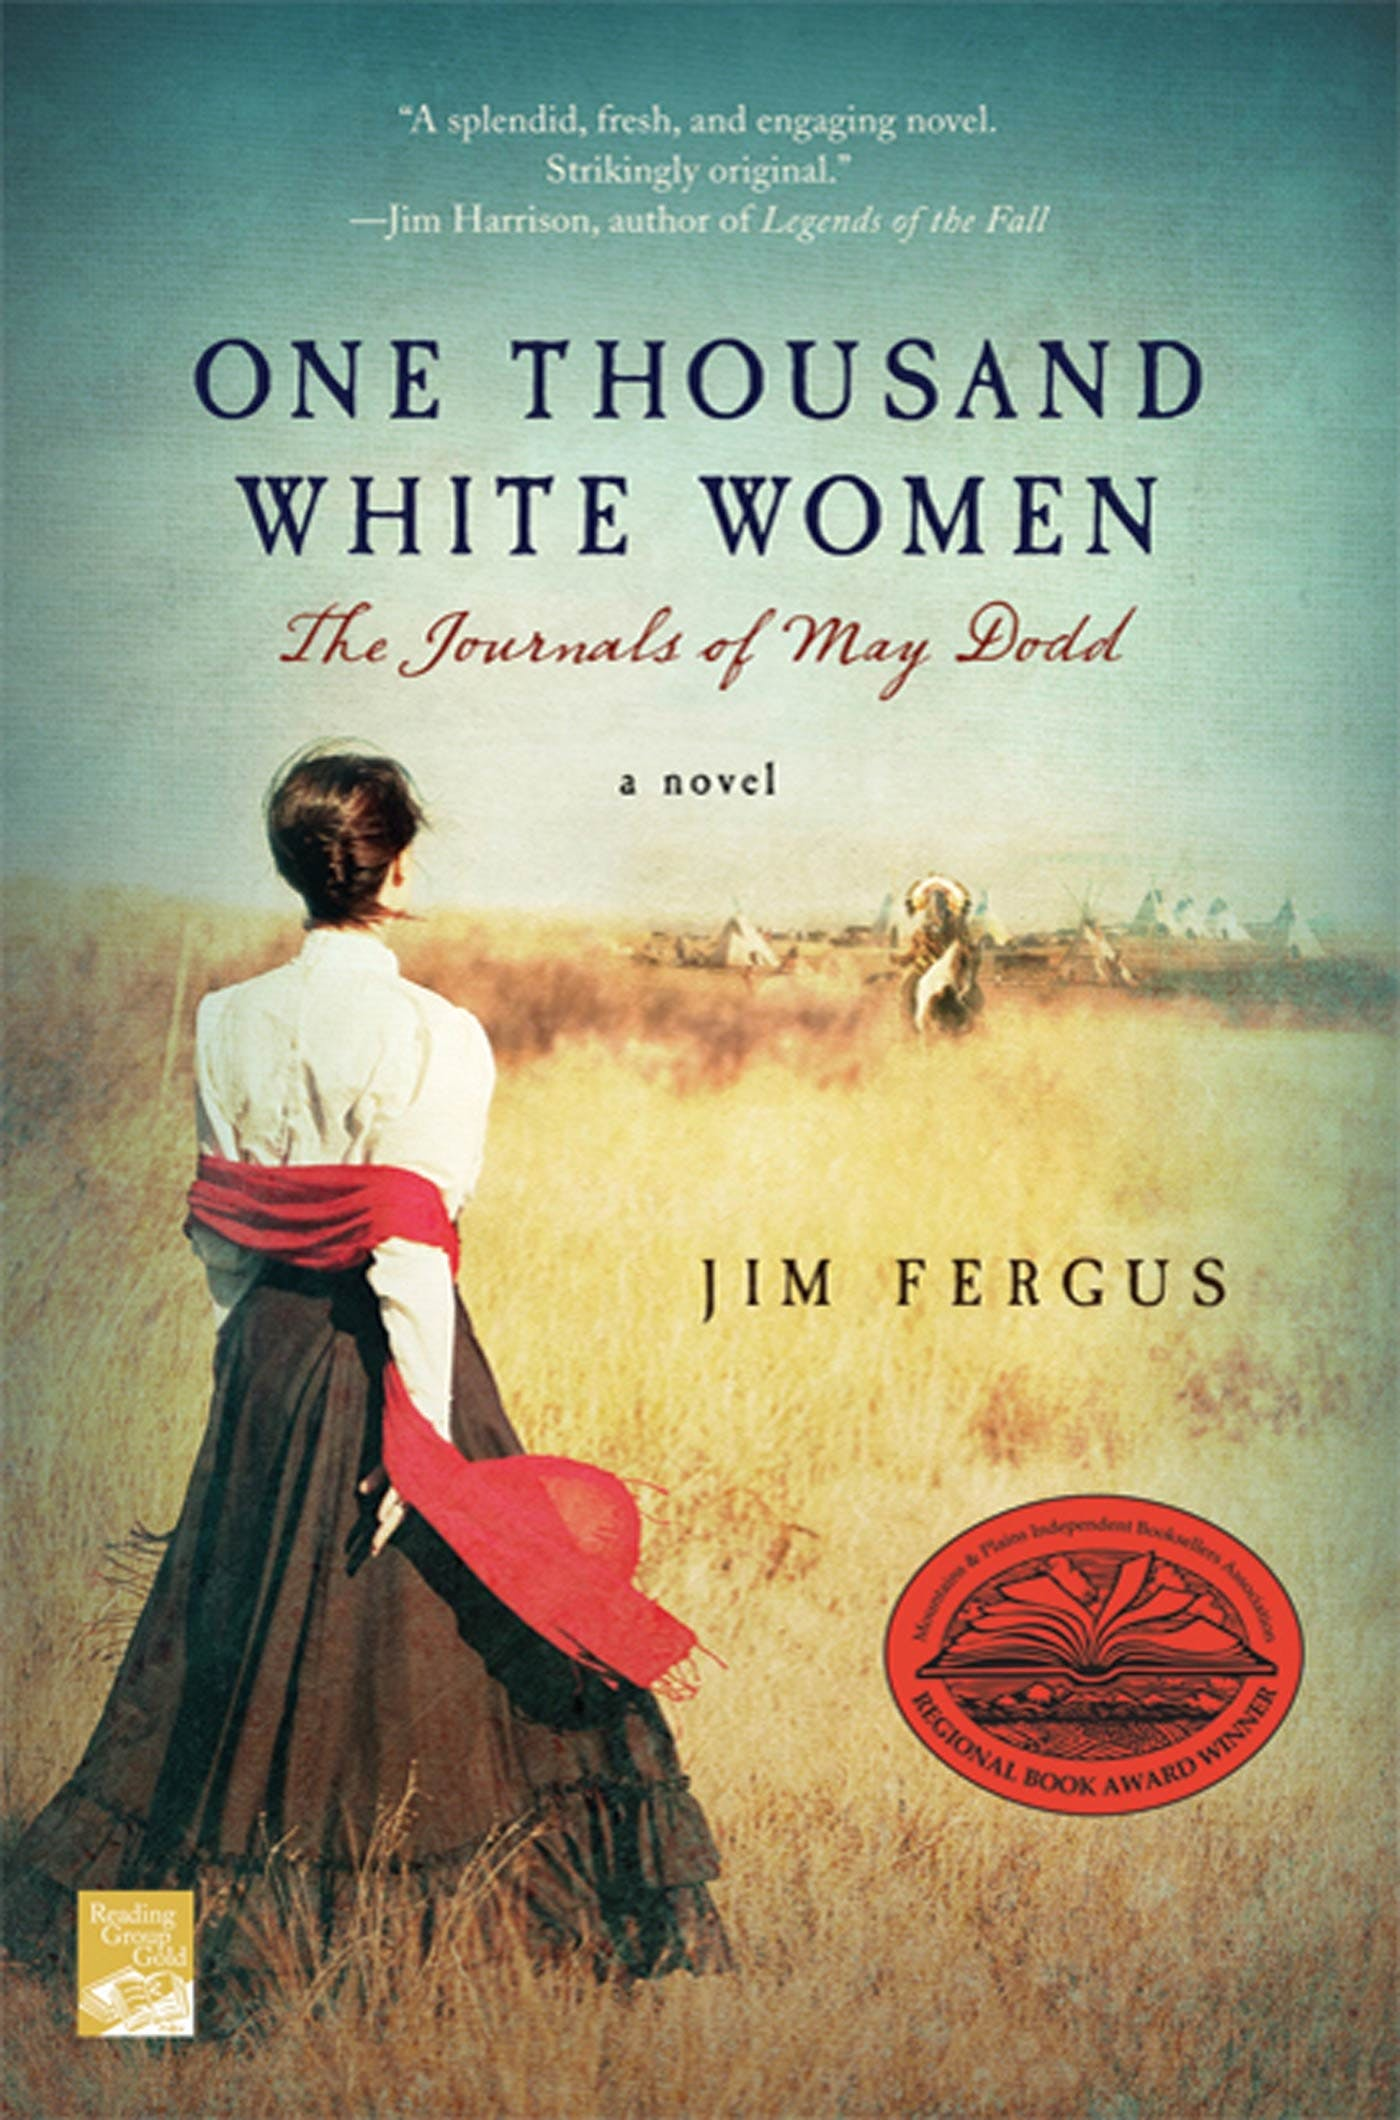 Image of One Thousand White Women